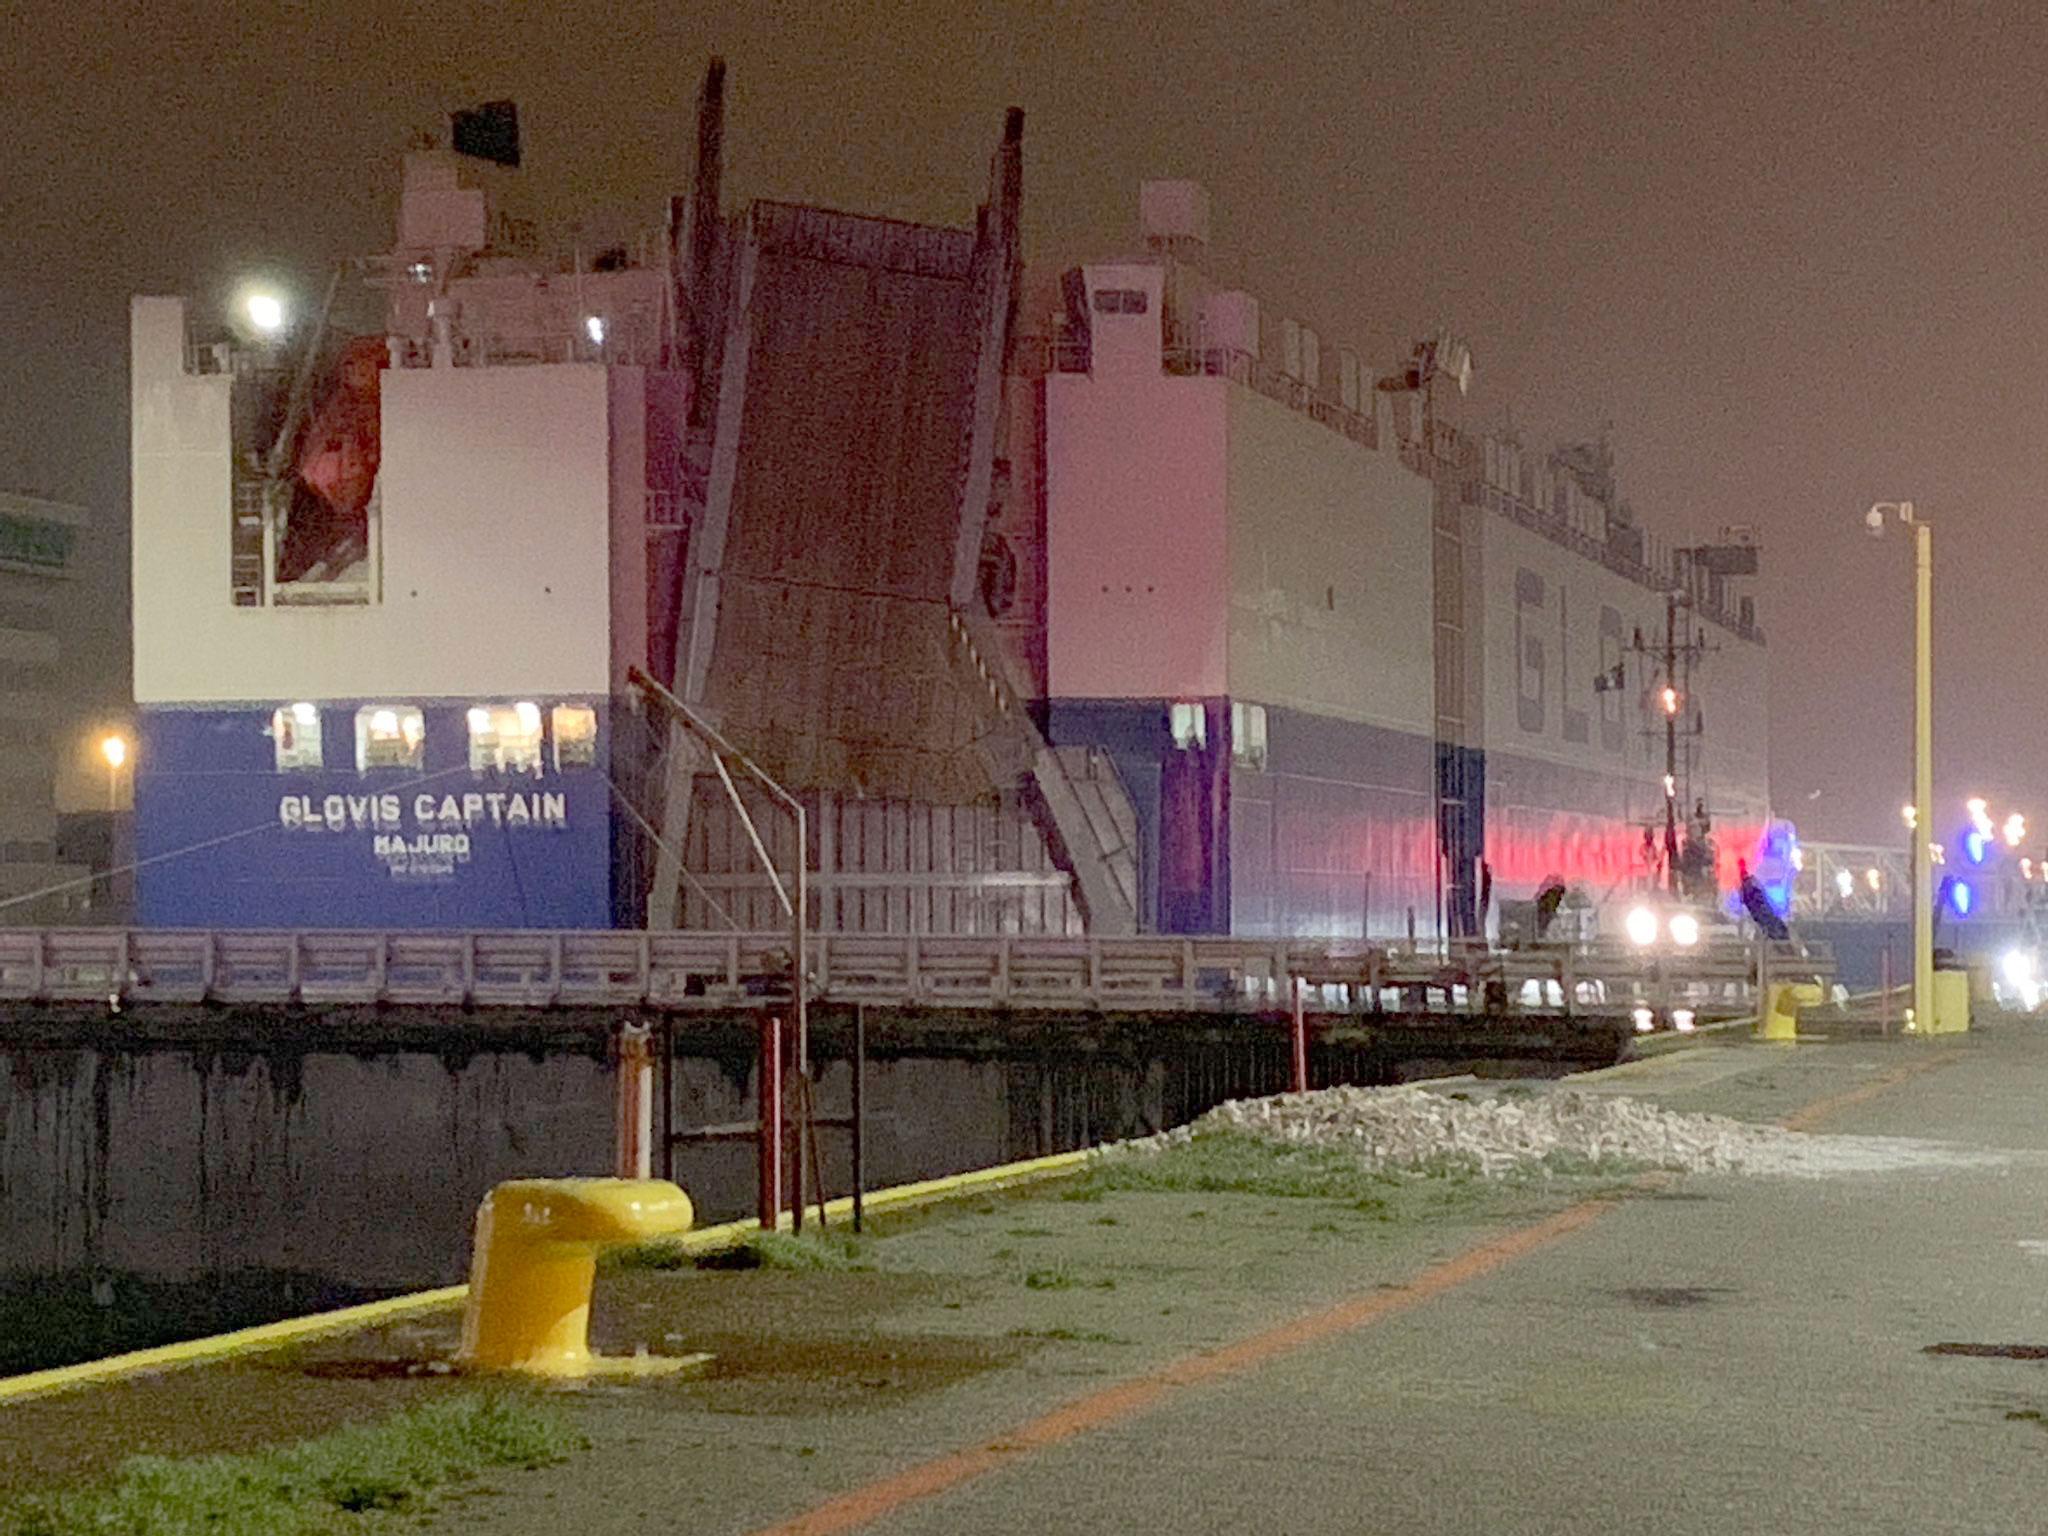 First Tesla Model 3 shipment reaches Europe, as Glovis Captain